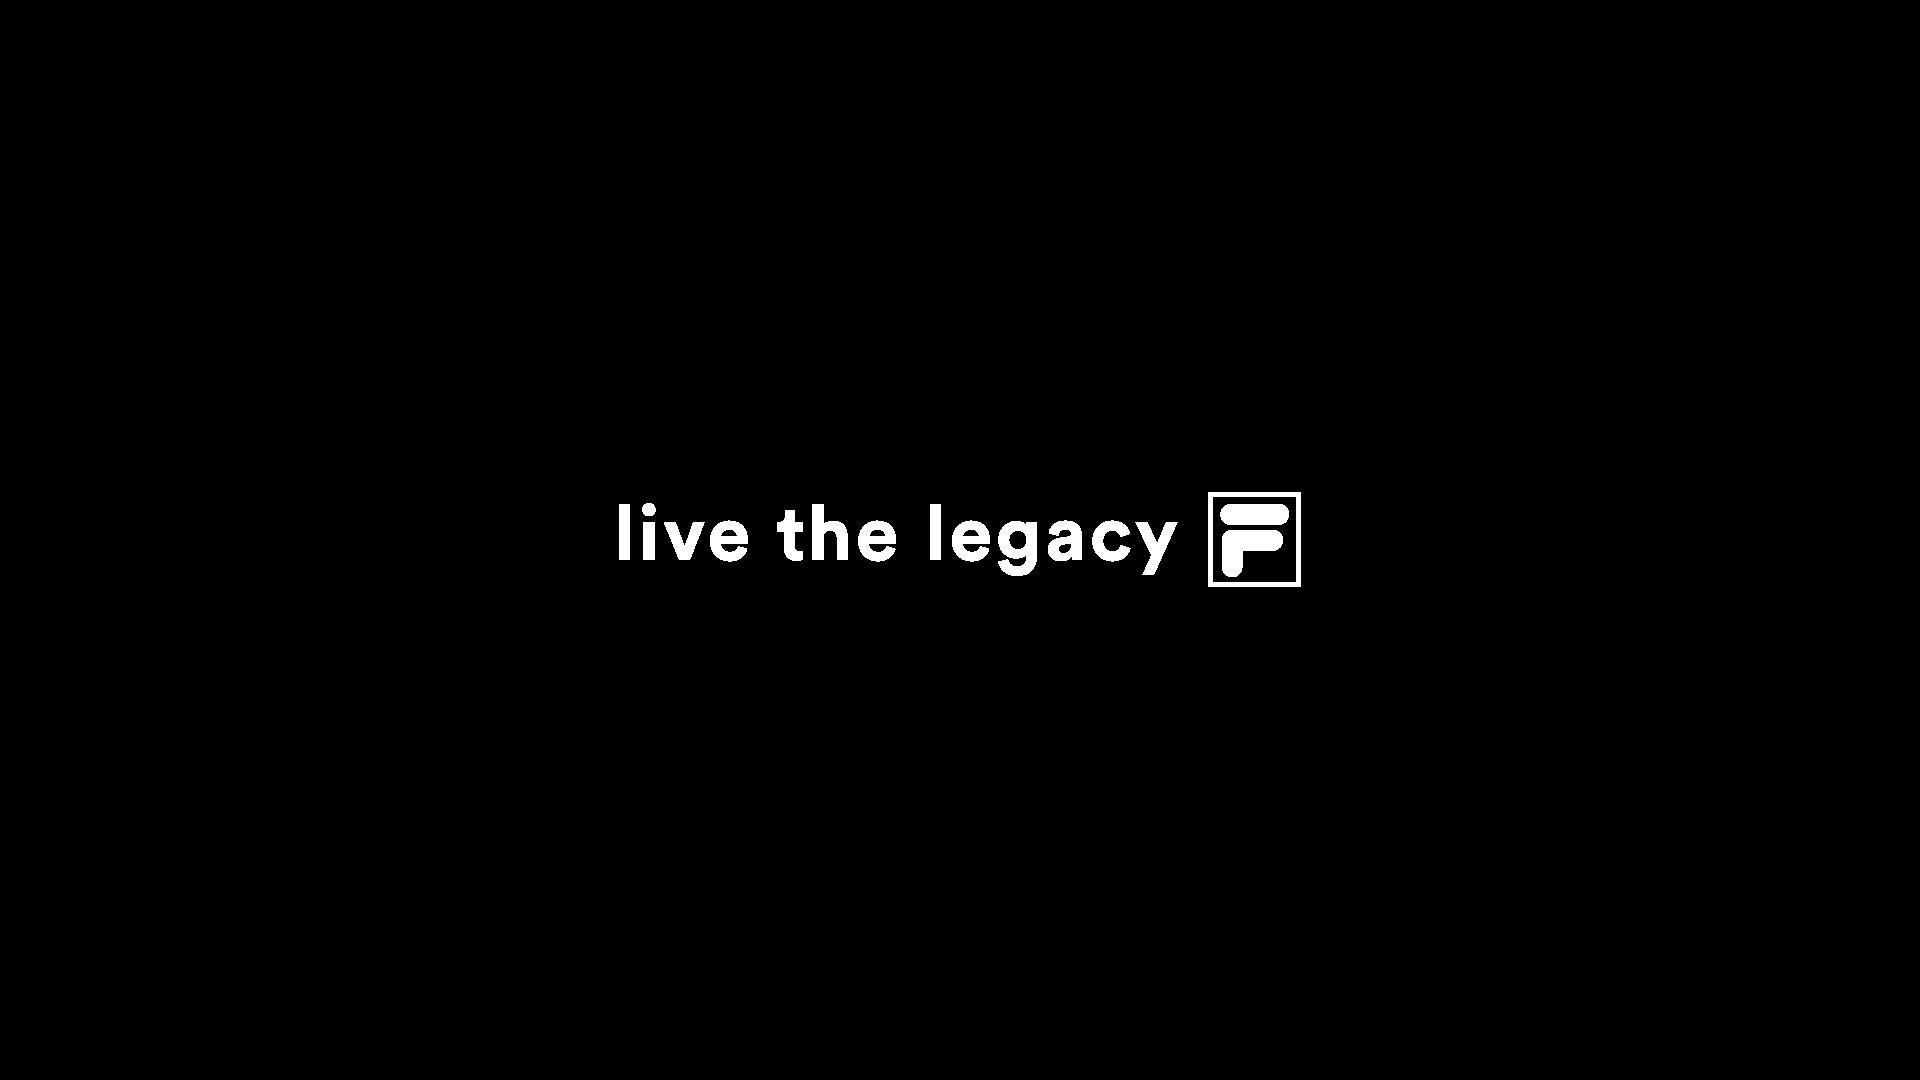 Fila Live the legacy